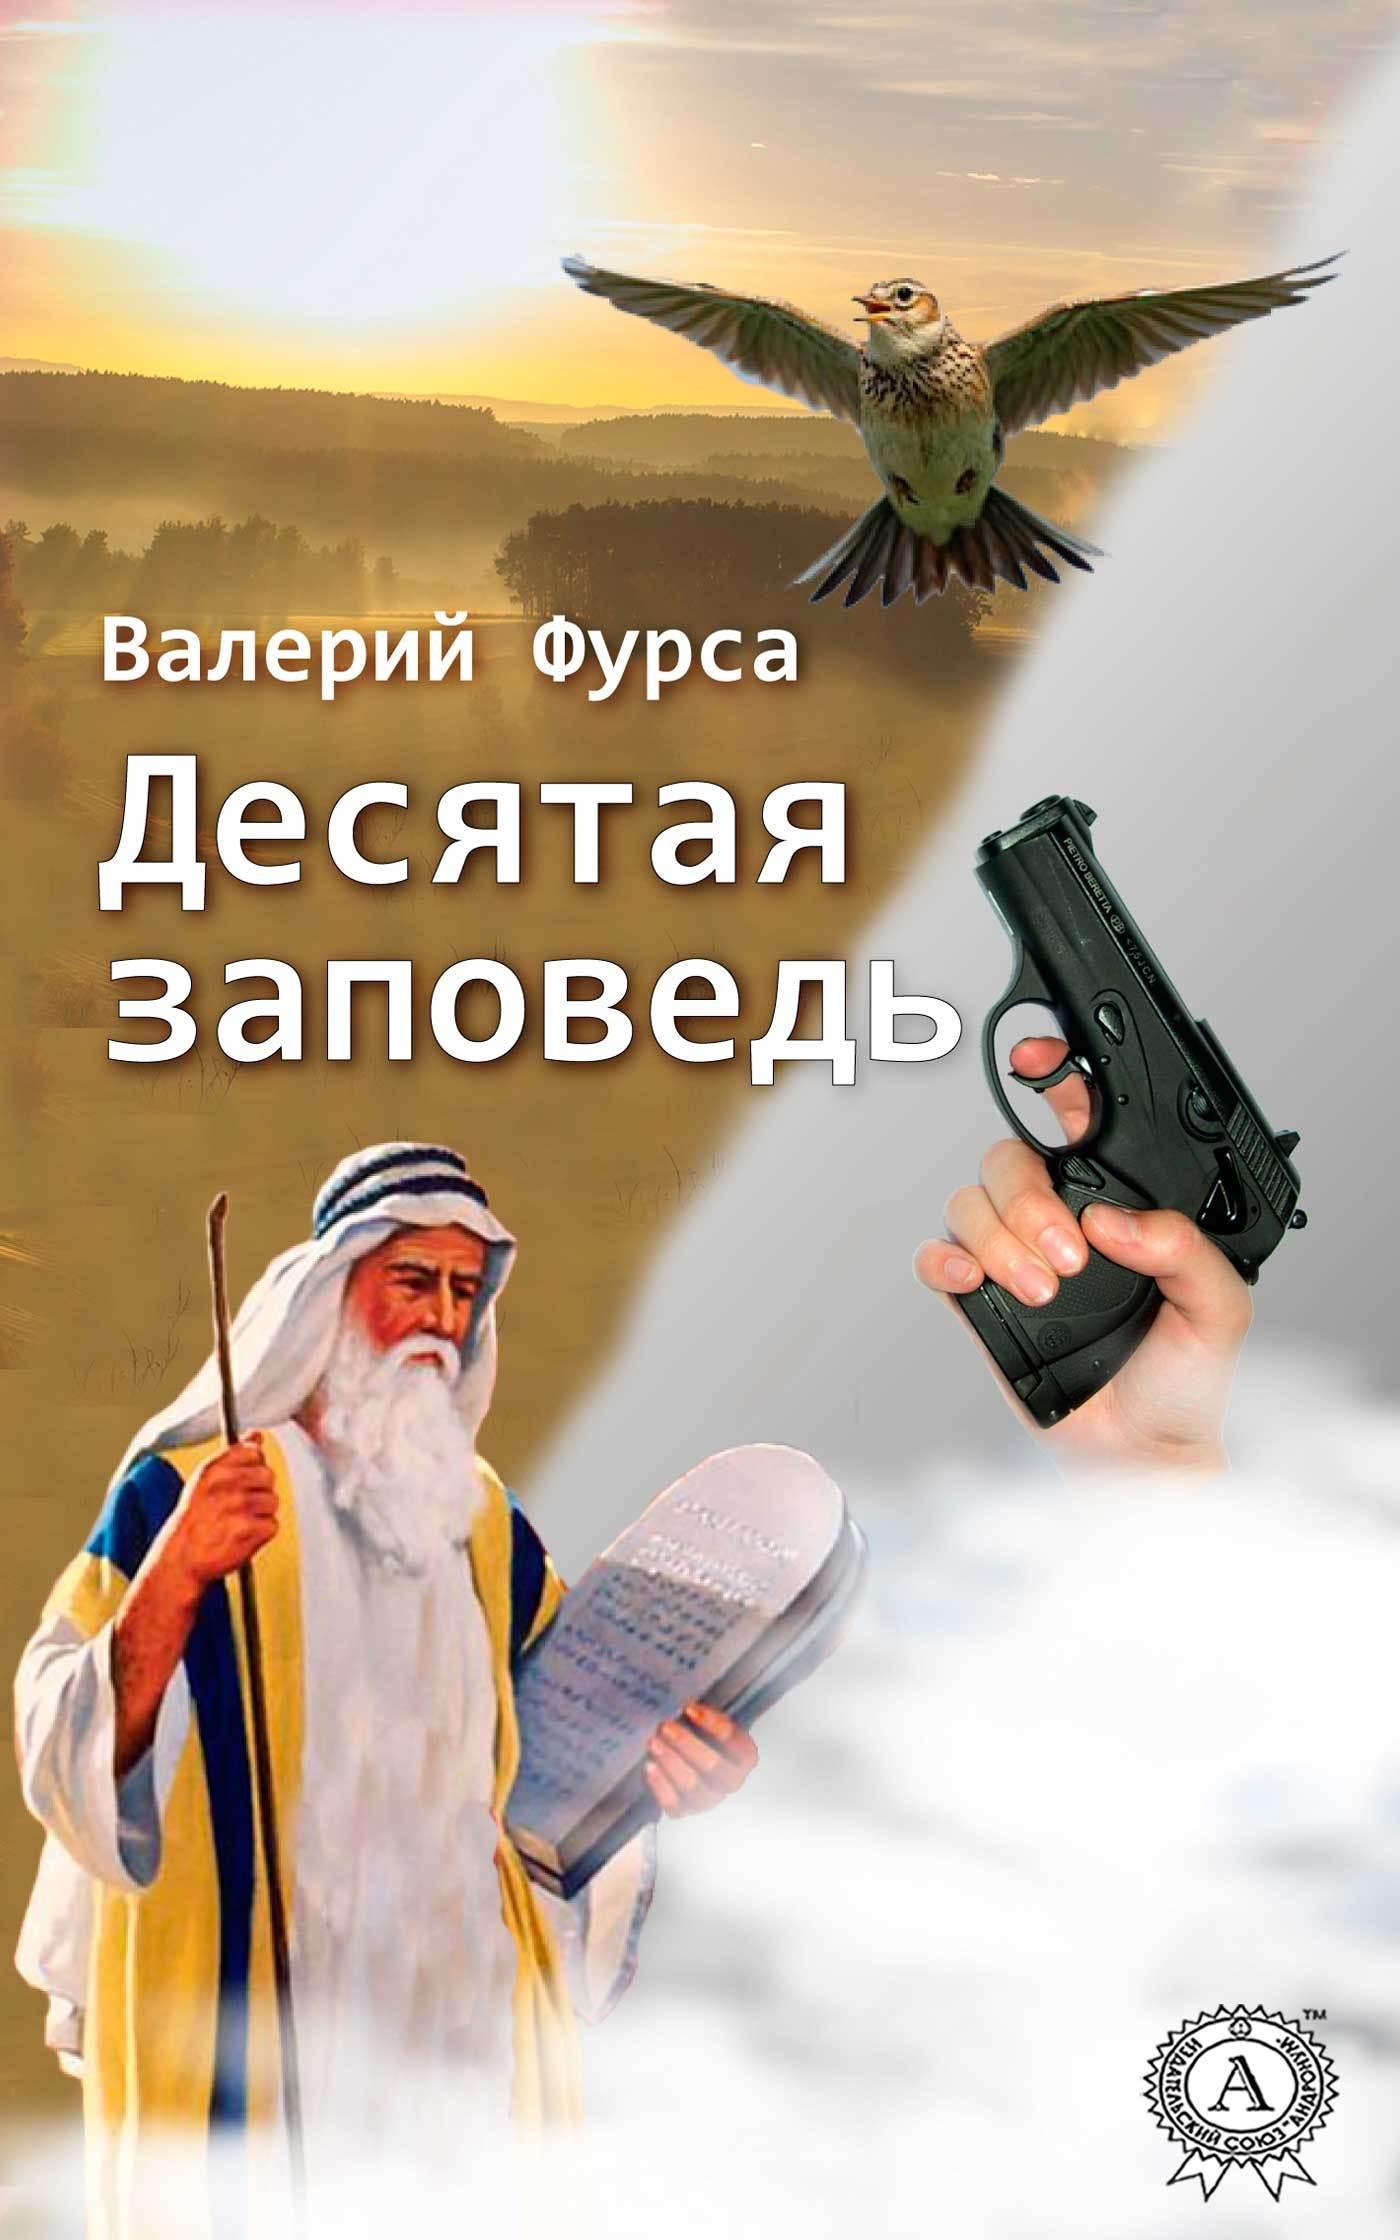 Валерий Фурса